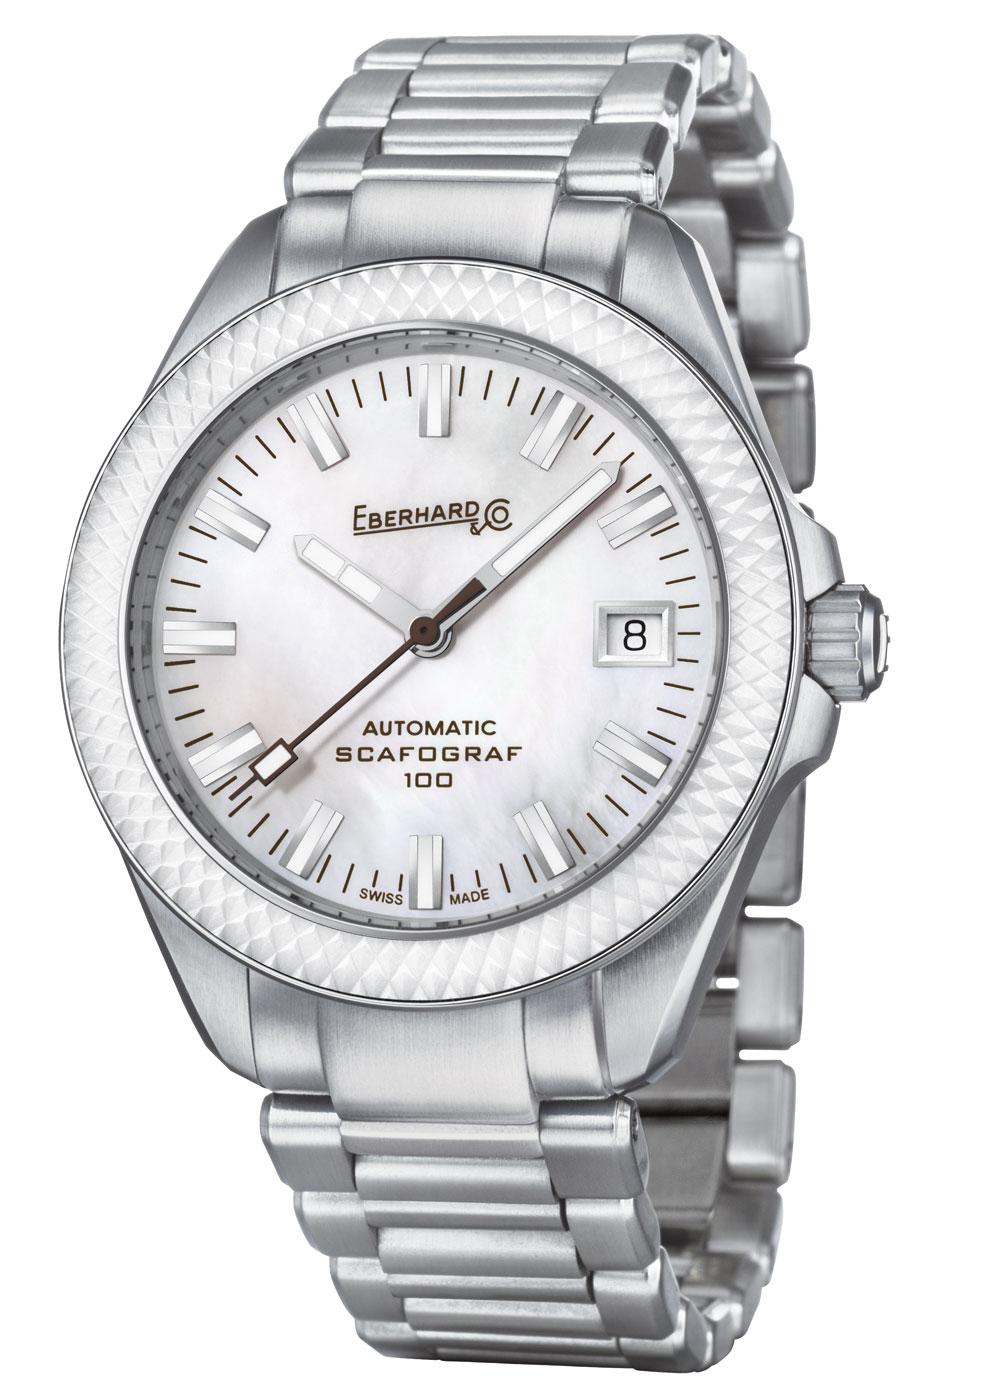 Reloj femenino Eberhard & Co: Scafograf 100